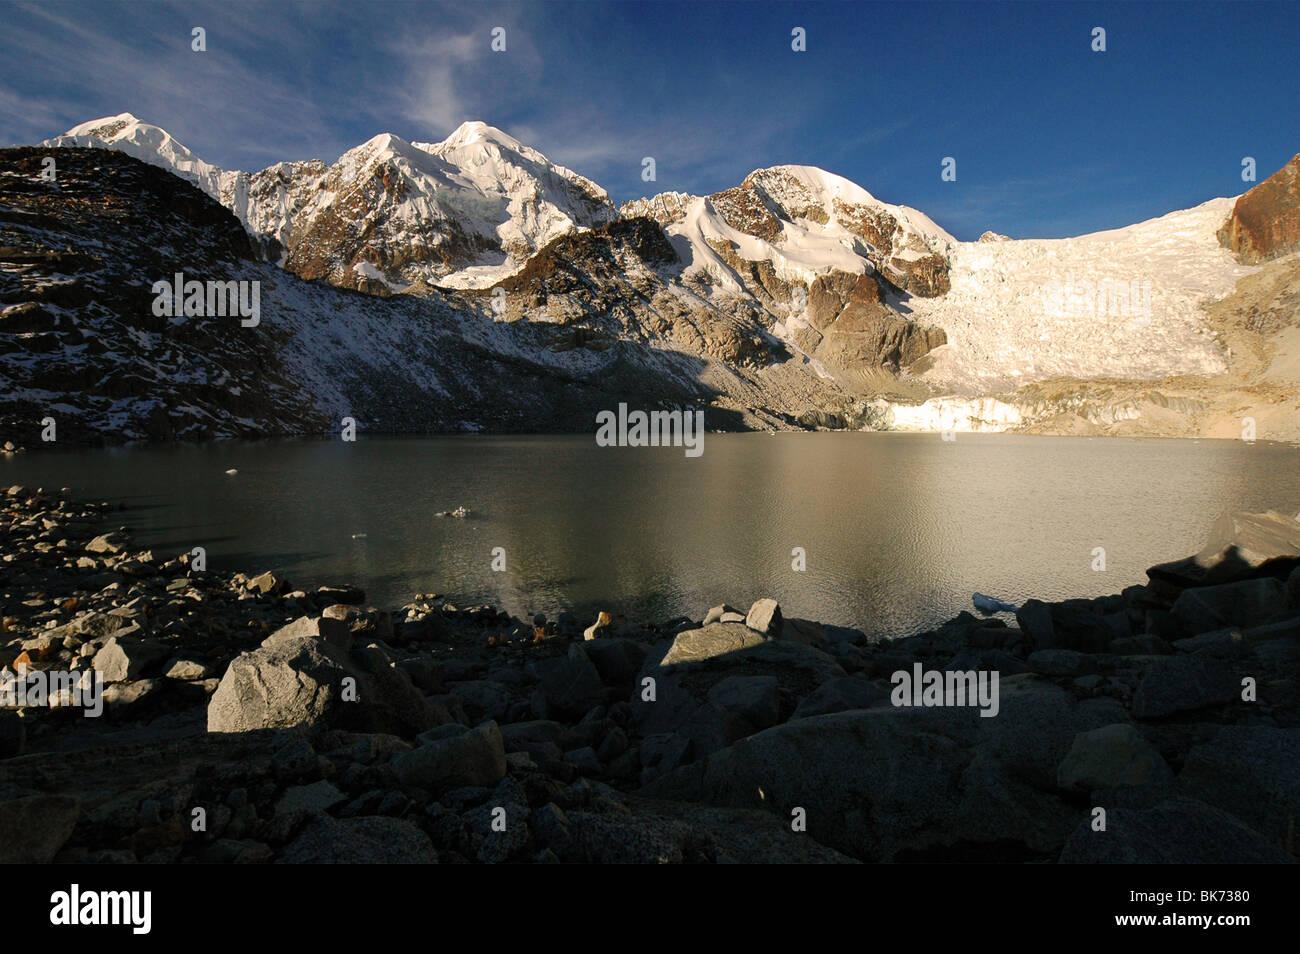 Scene from the Cordillera Real in Bolivia. - Stock Image